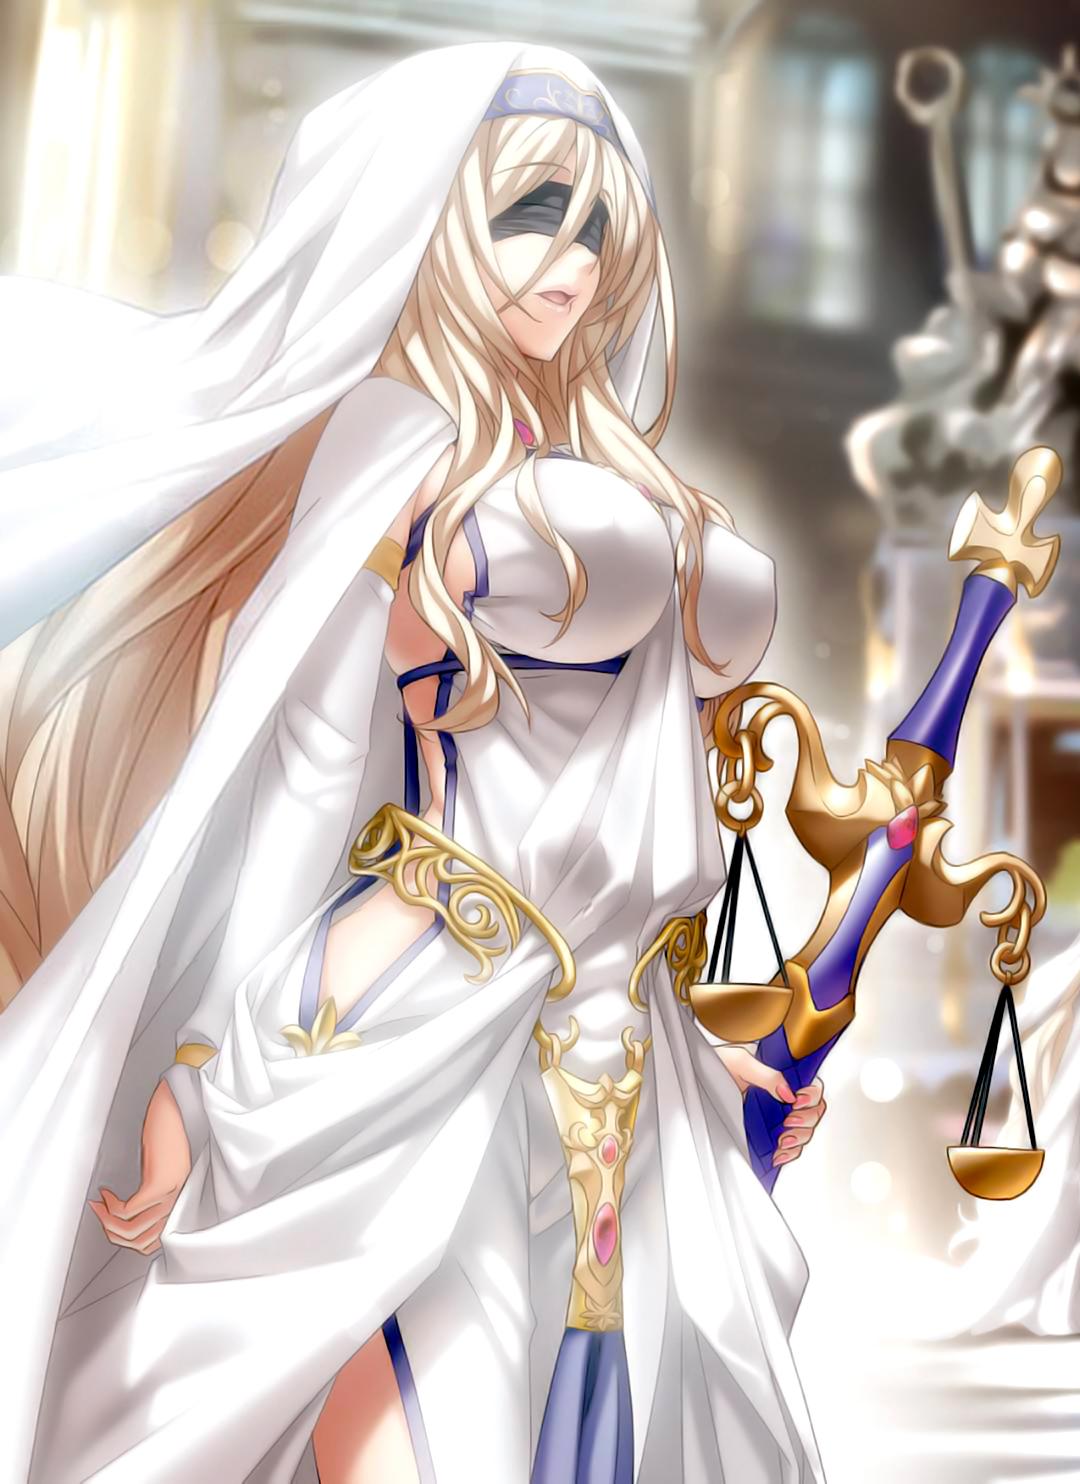 Sword Maiden Goblin Slayer Wiki Fandom